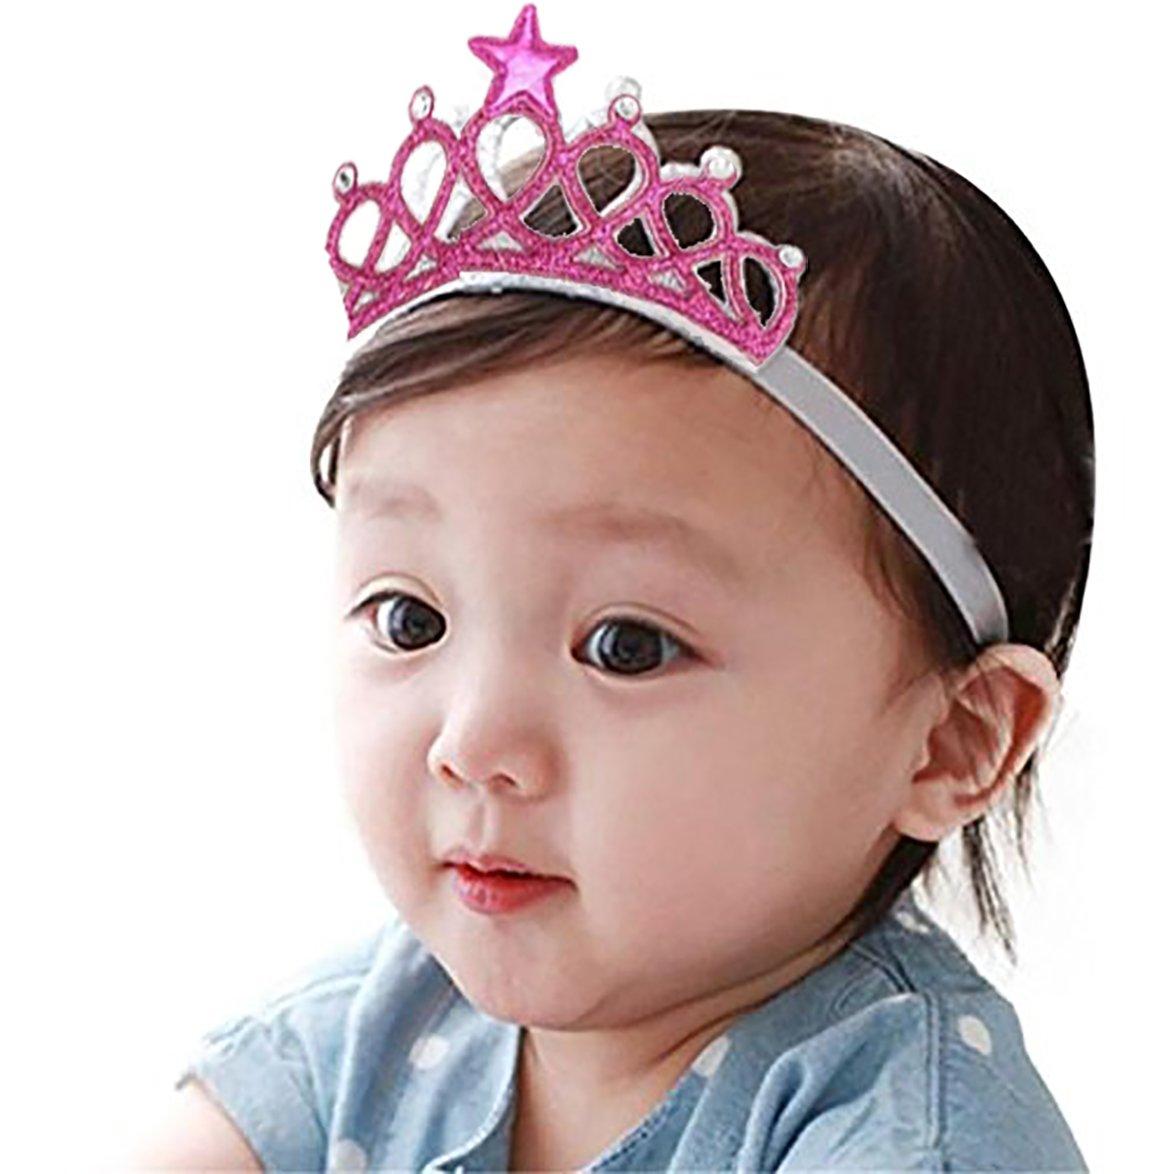 Ziory Pink Baby Girl Baby Boy Unisex Rhinestone Crown Headbands Toddler  Princess Headband Hair Accessories Birthday Gift Tiara Crown Headband   Amazon.in  ... b0855a3f335